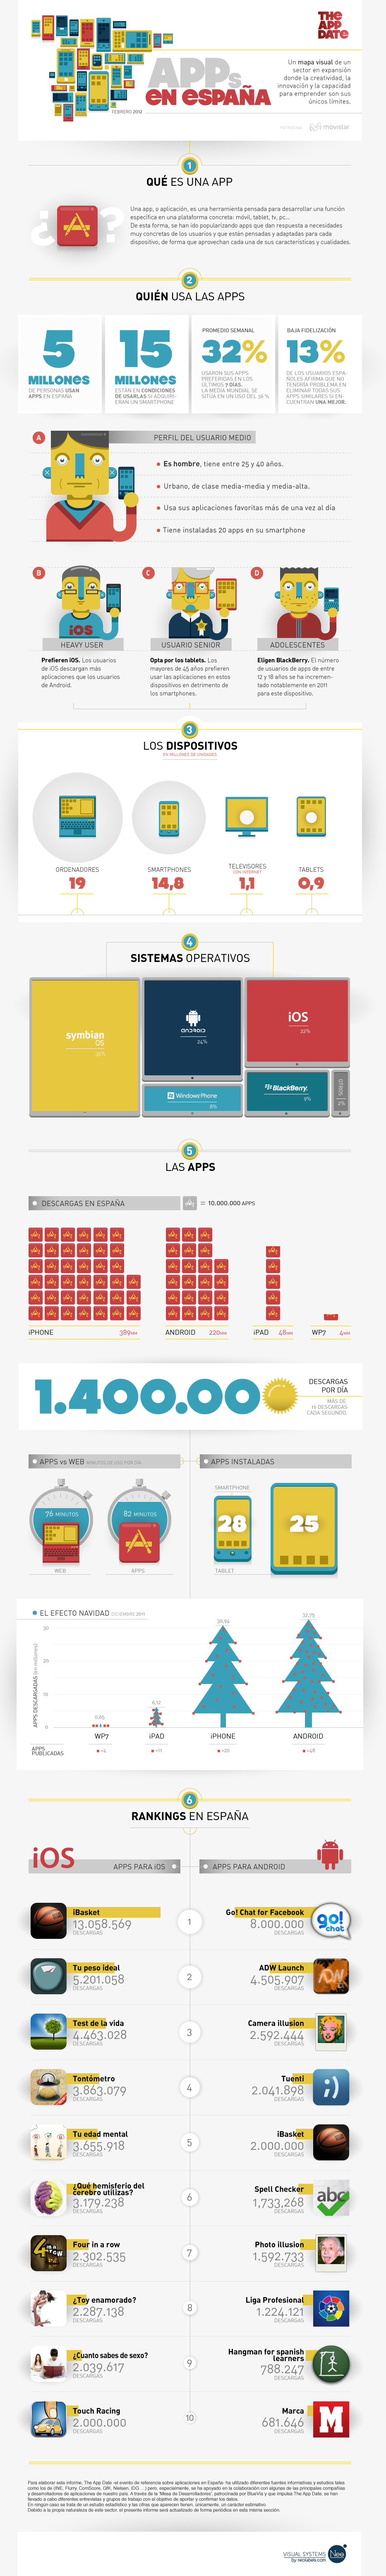 Segundo informe de las apps de The App Date